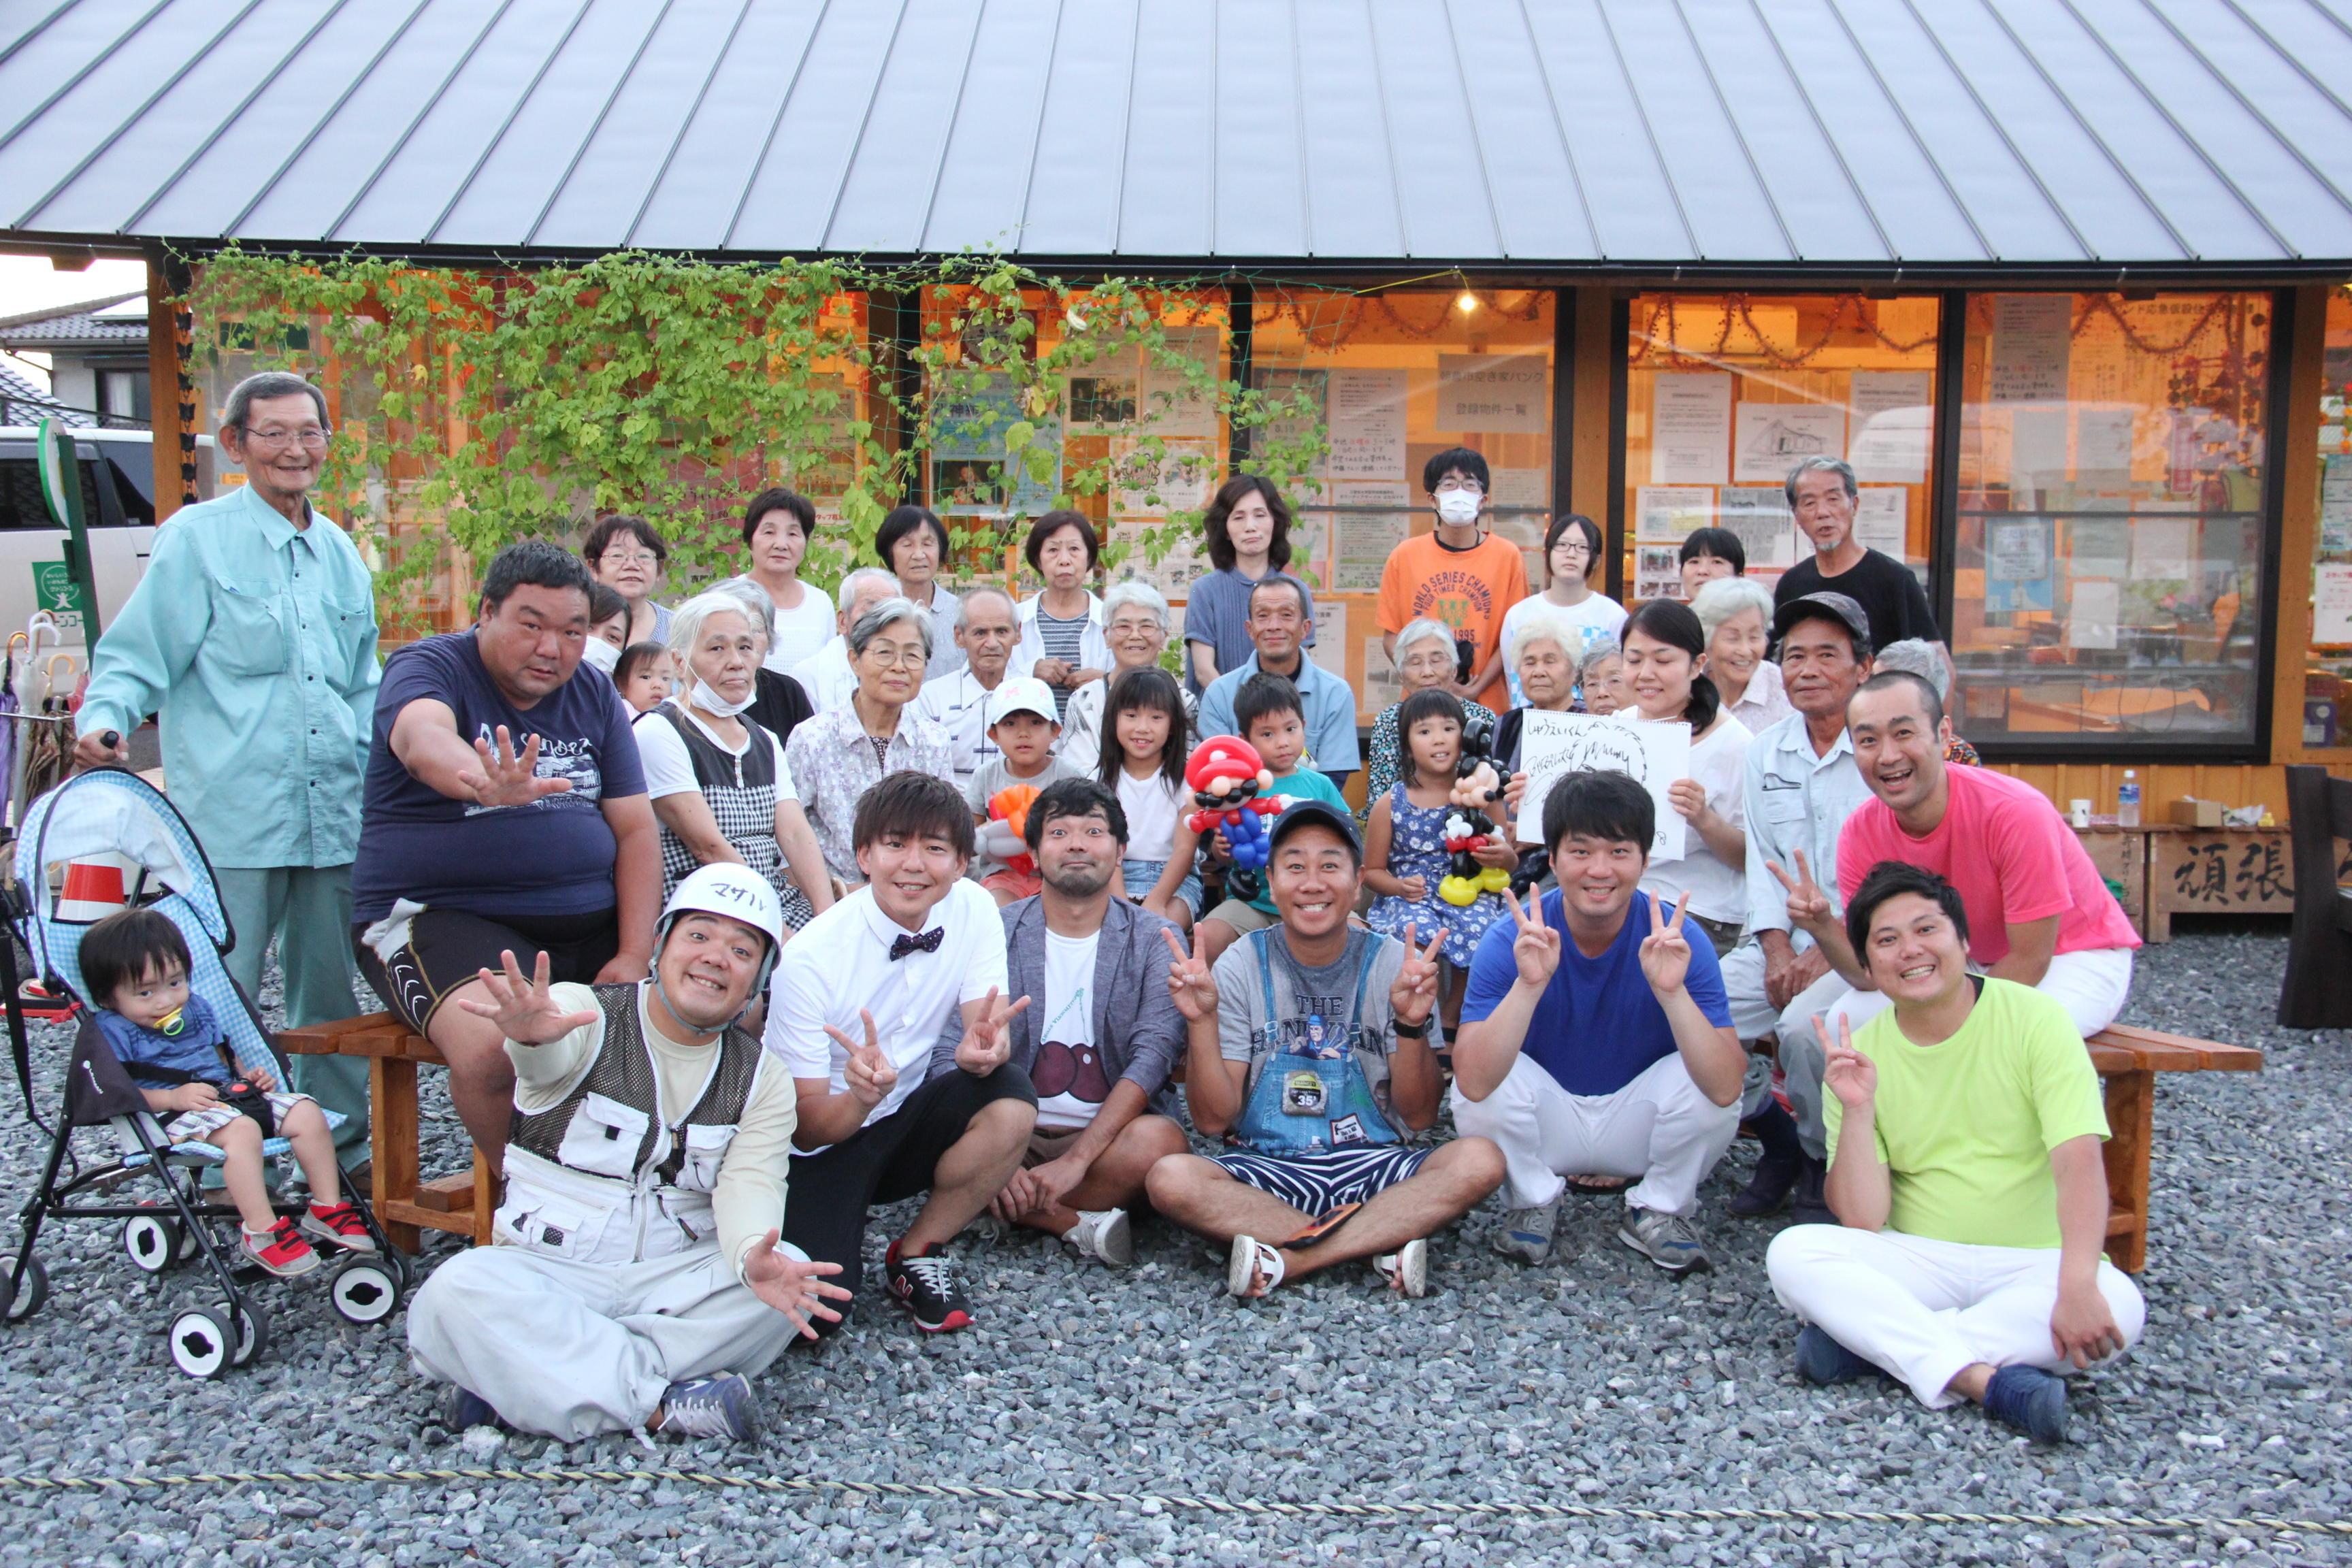 http://news.yoshimoto.co.jp/20180809125053-37e4b45c739a1fa16a9fc6f901f6eed3a51f6996.jpg